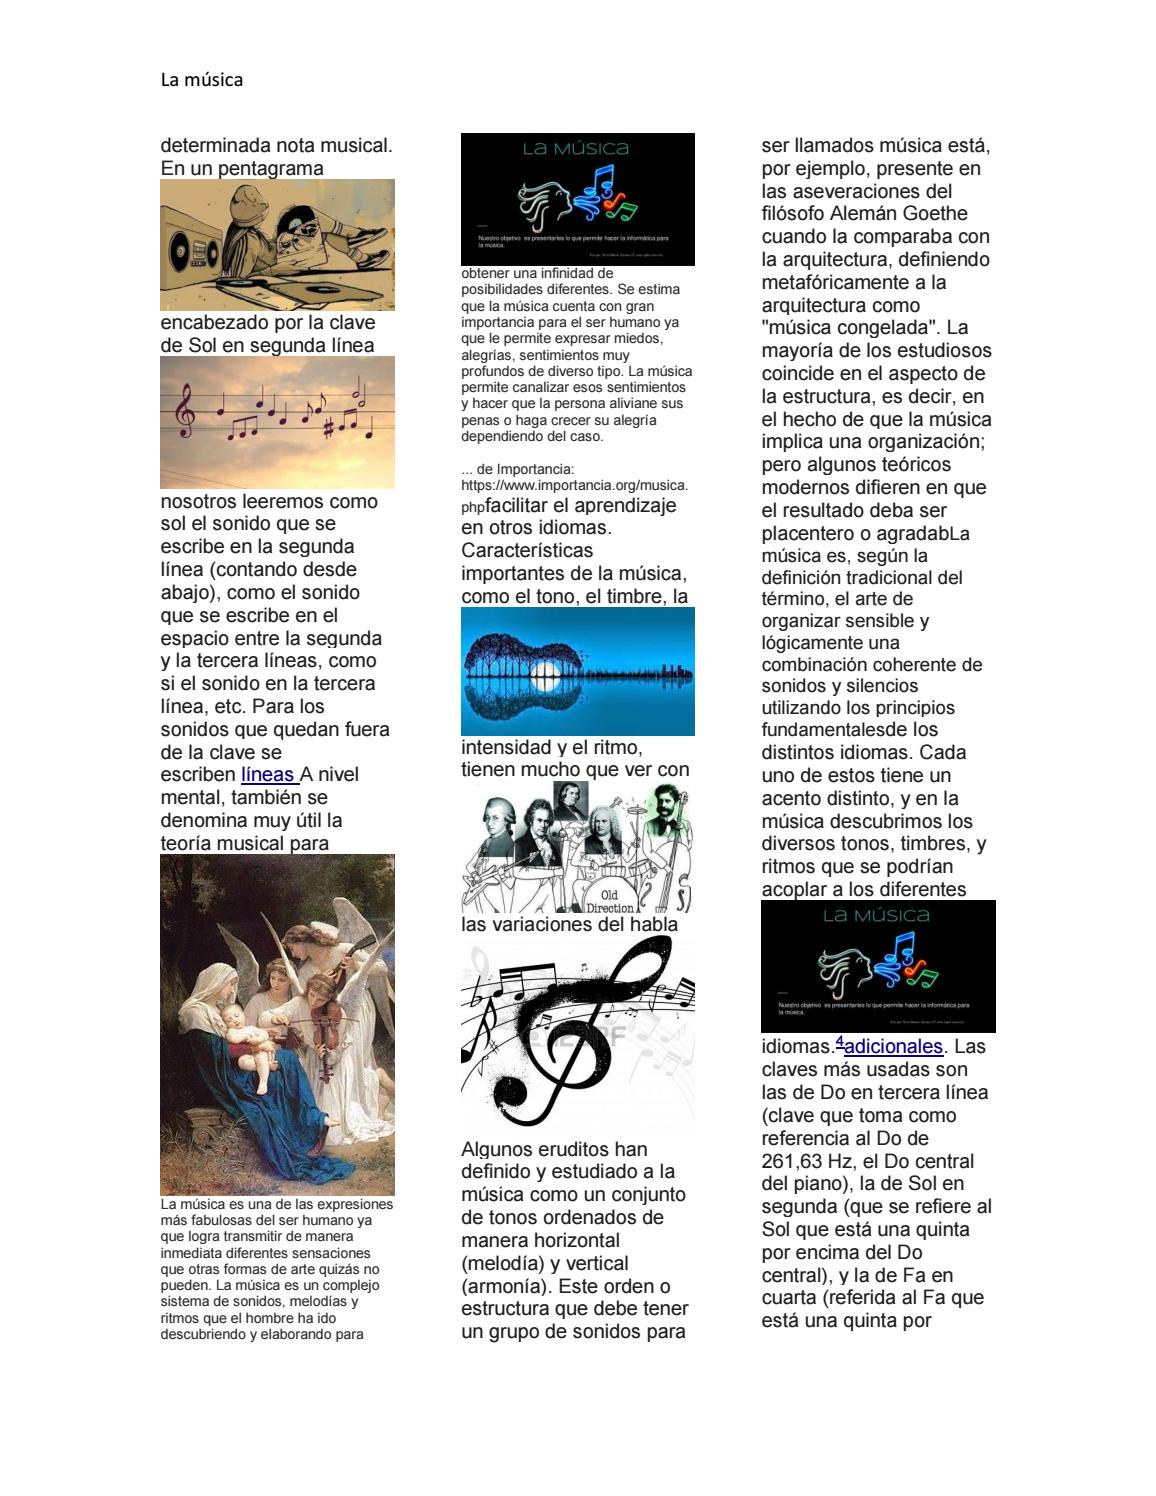 La Musica By Dani Santiago Duarte Coronado Issuu